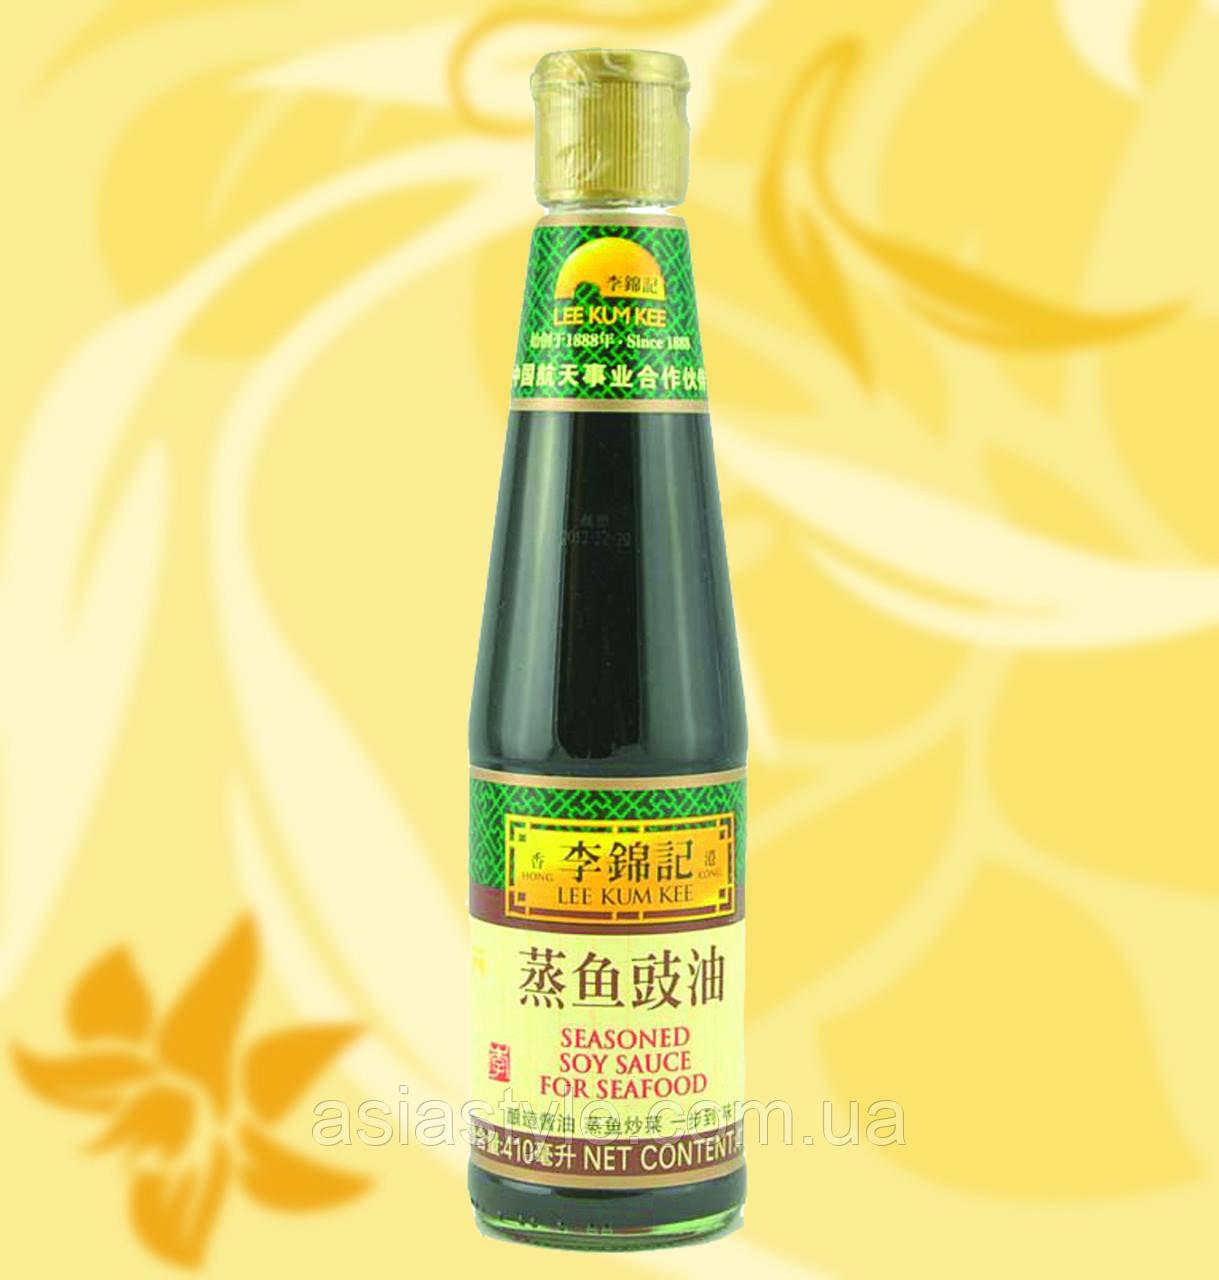 Соус соєвий для морепродуктів, Seasoned Soy Sauce for Seafood, Lee Kum Kee,Китай, 410мл, Ч